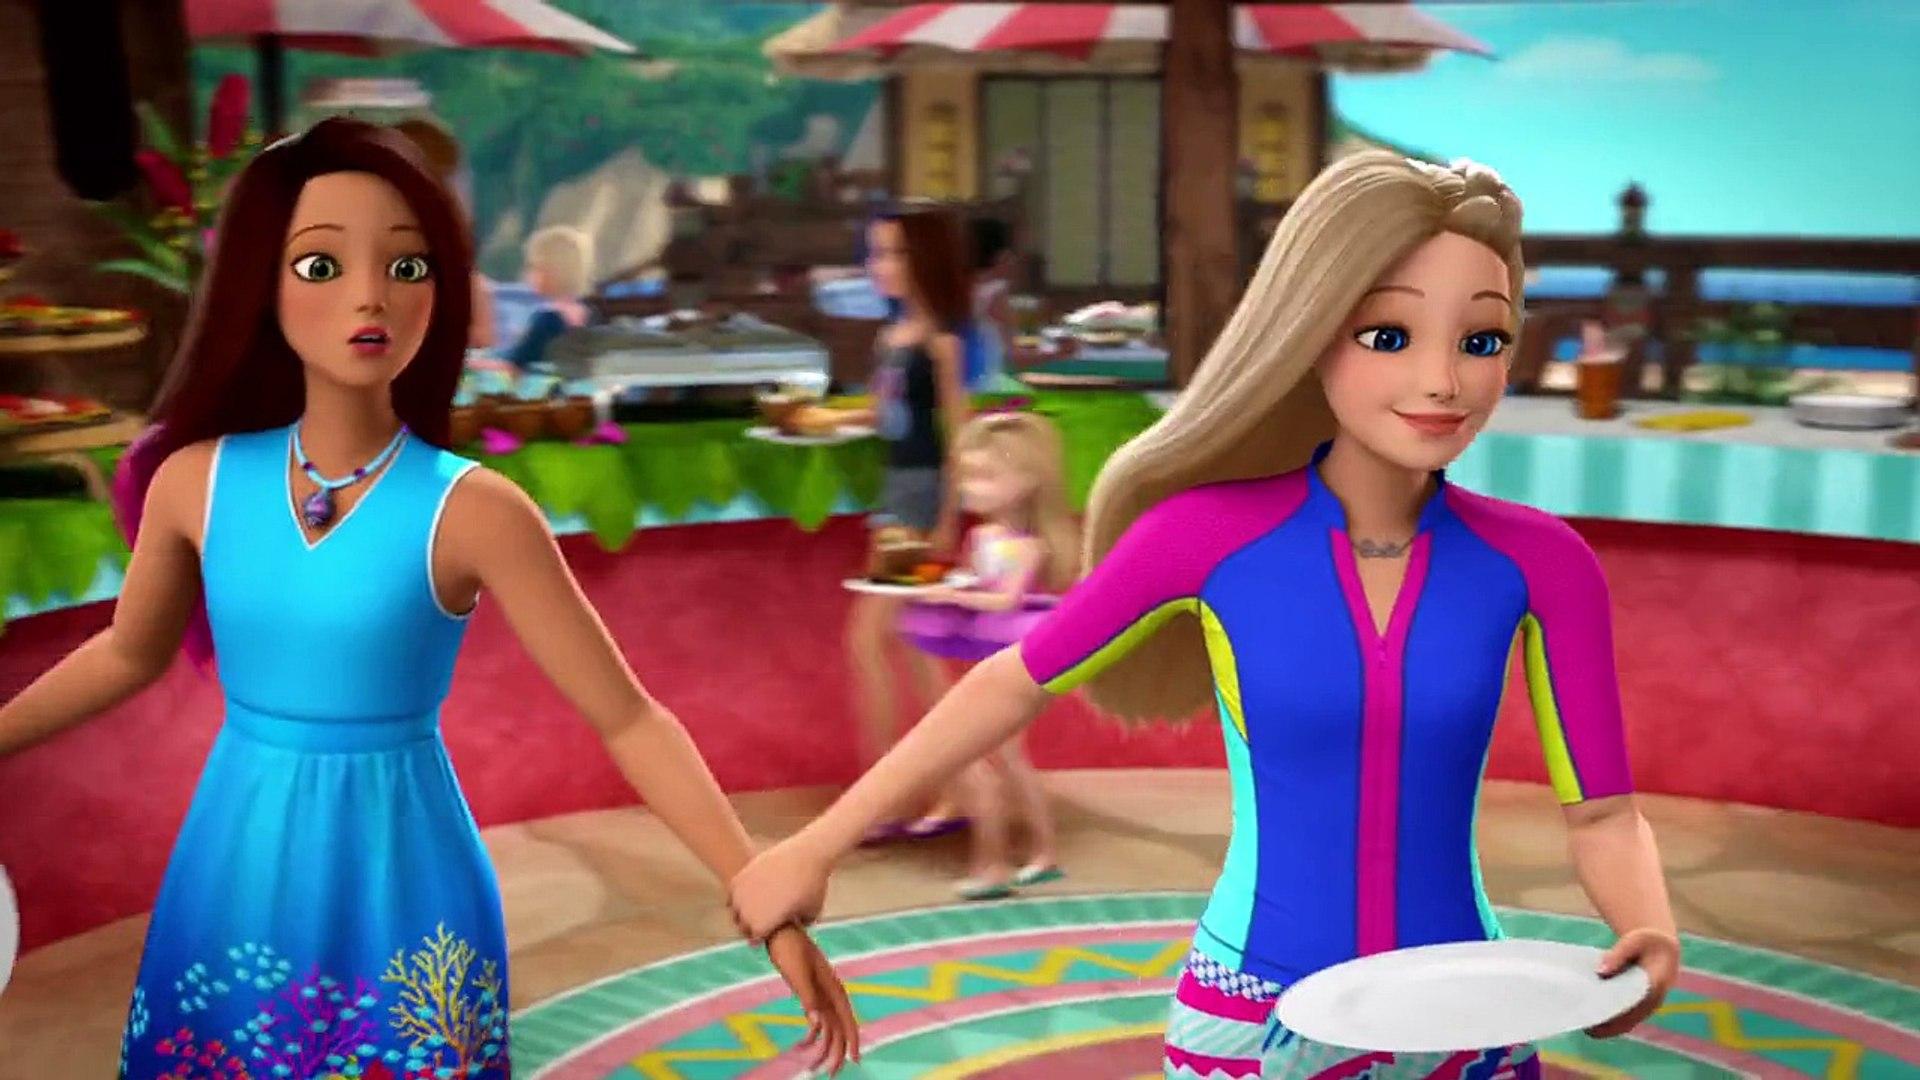 Barbie Dolphin 2017 Hindi Dubbed Full Movie